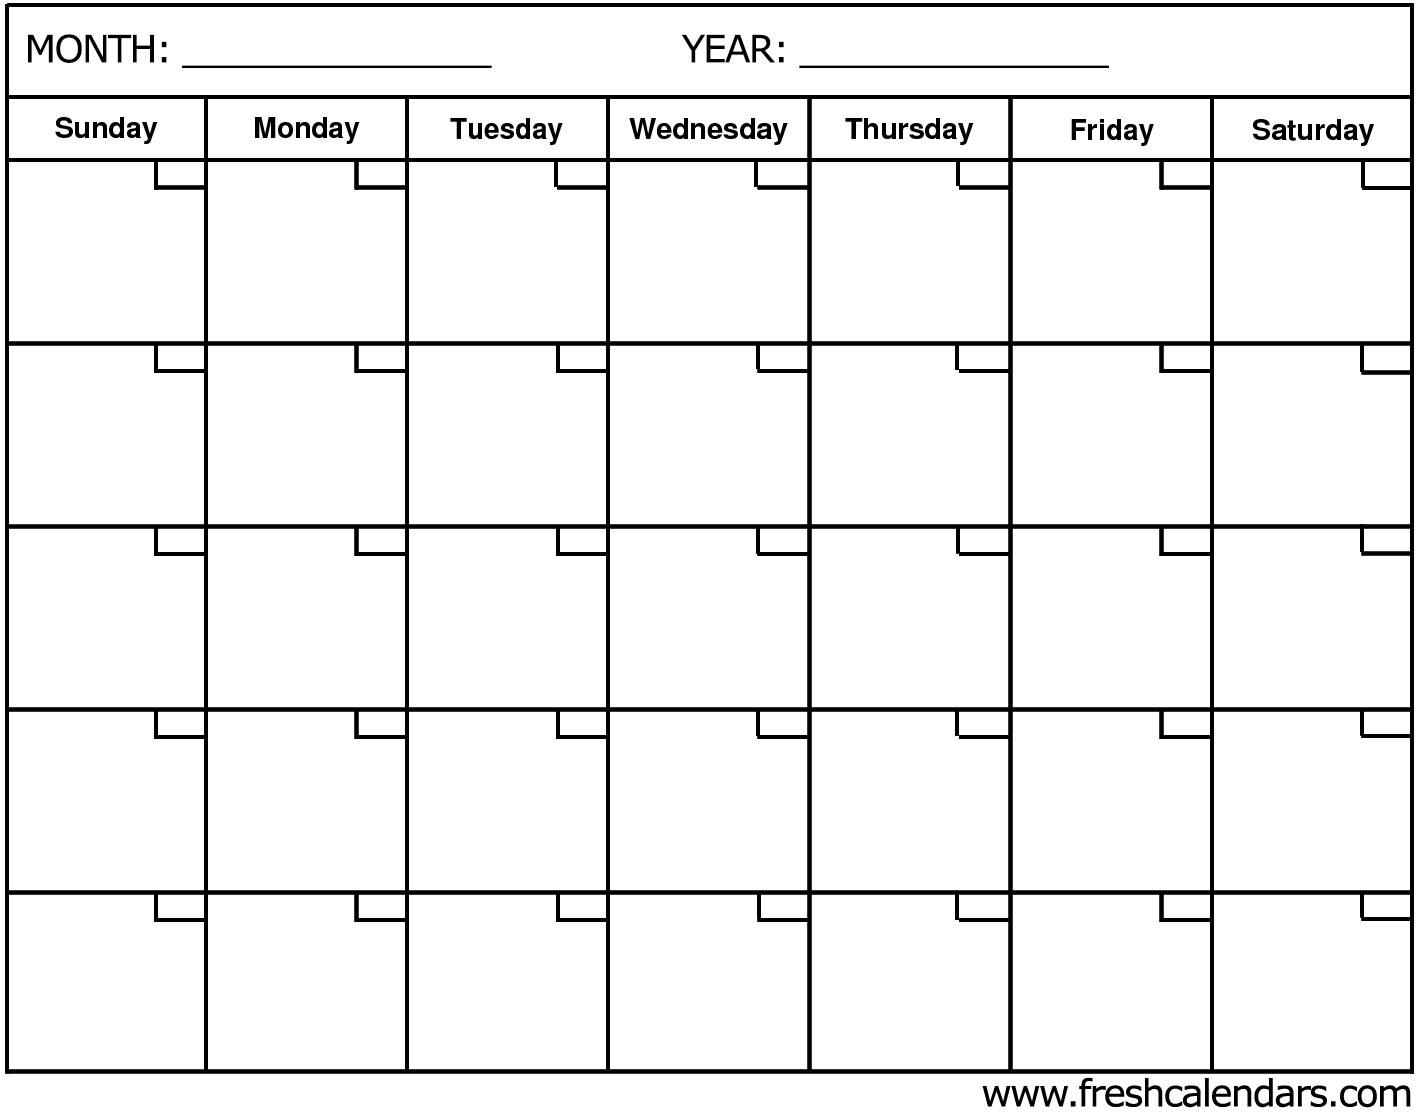 Blank Calendar: Wonderfully Printable 2019 Templates in Blank Calendar For A Month